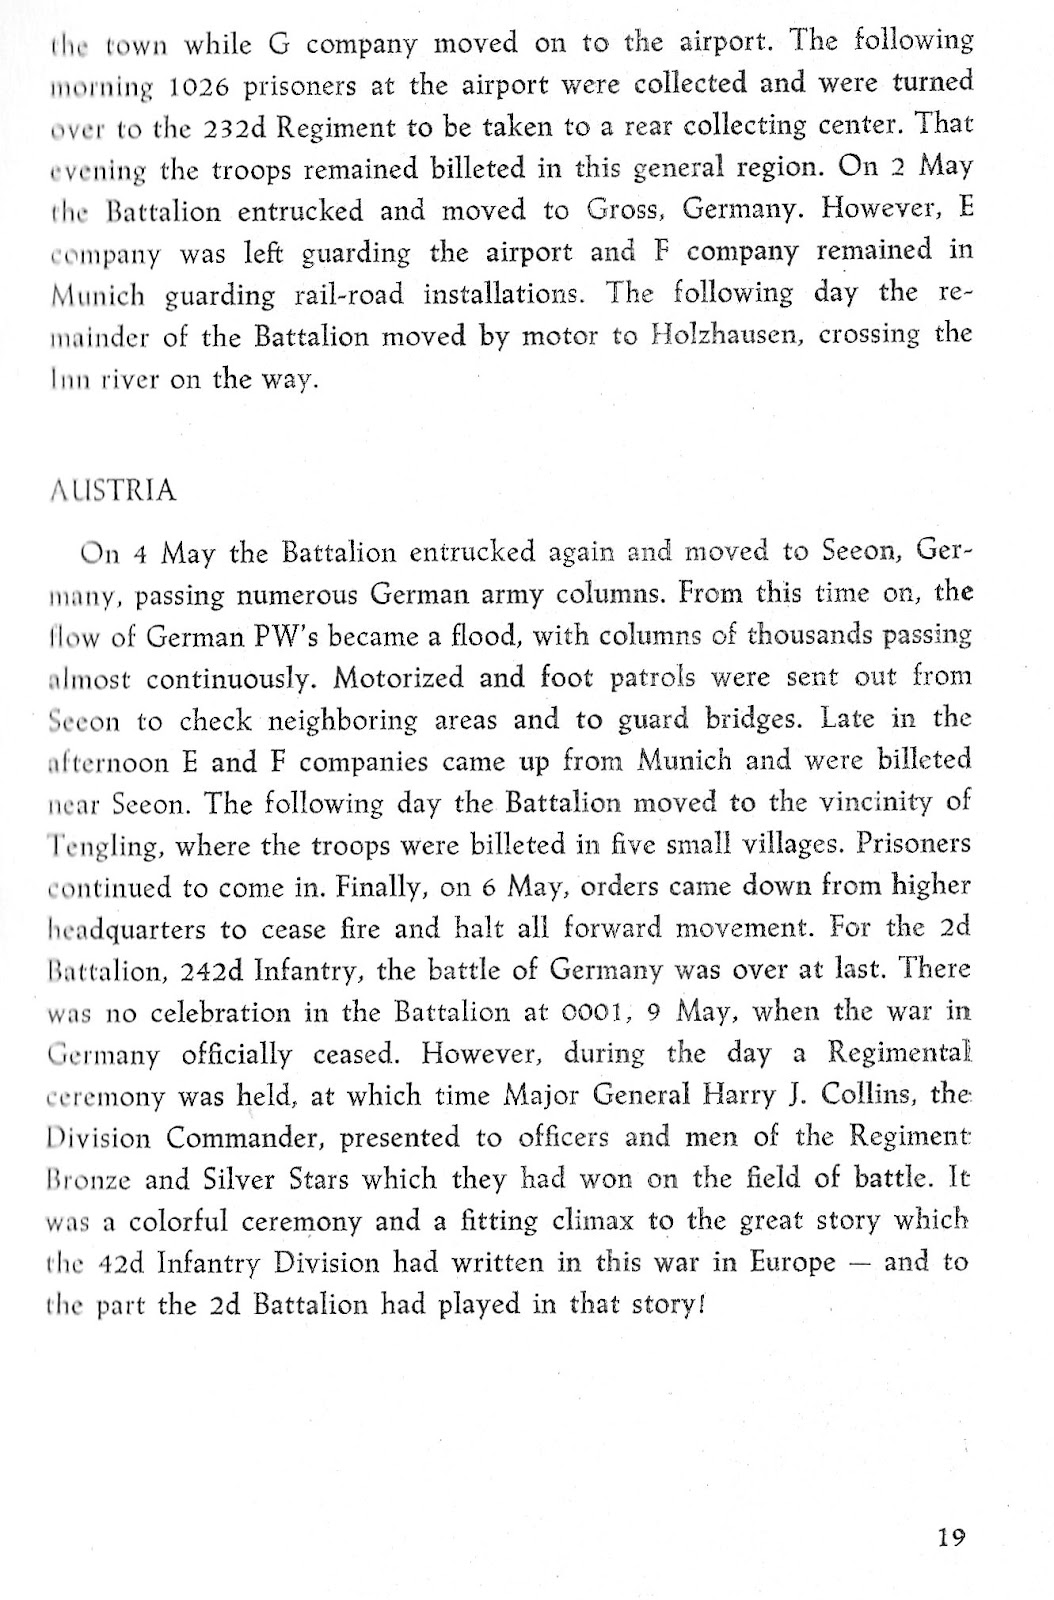 History pg19.jpg